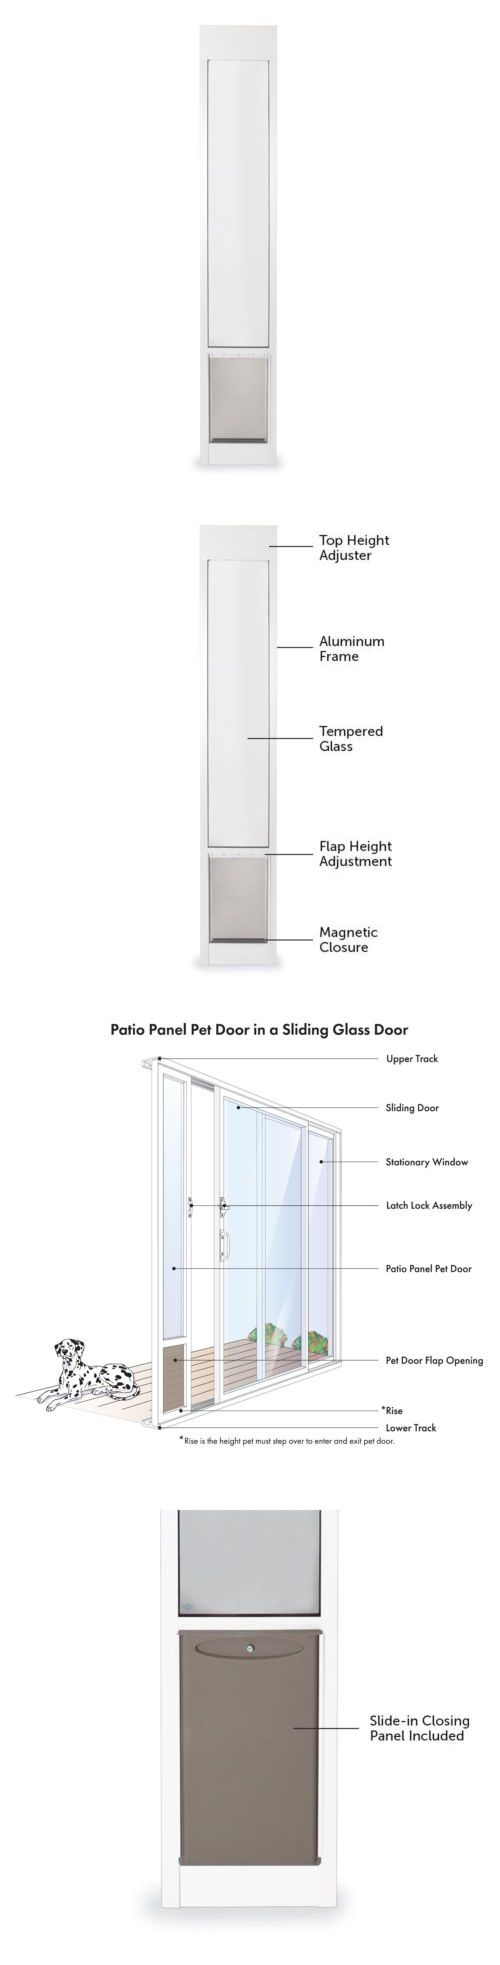 25 melhores ideias de sliding glass dog door no pinterest porta doors and flaps 116379 patio pet door sliding glass dog panel petsafe large aluminum cat eventelaan Choice Image